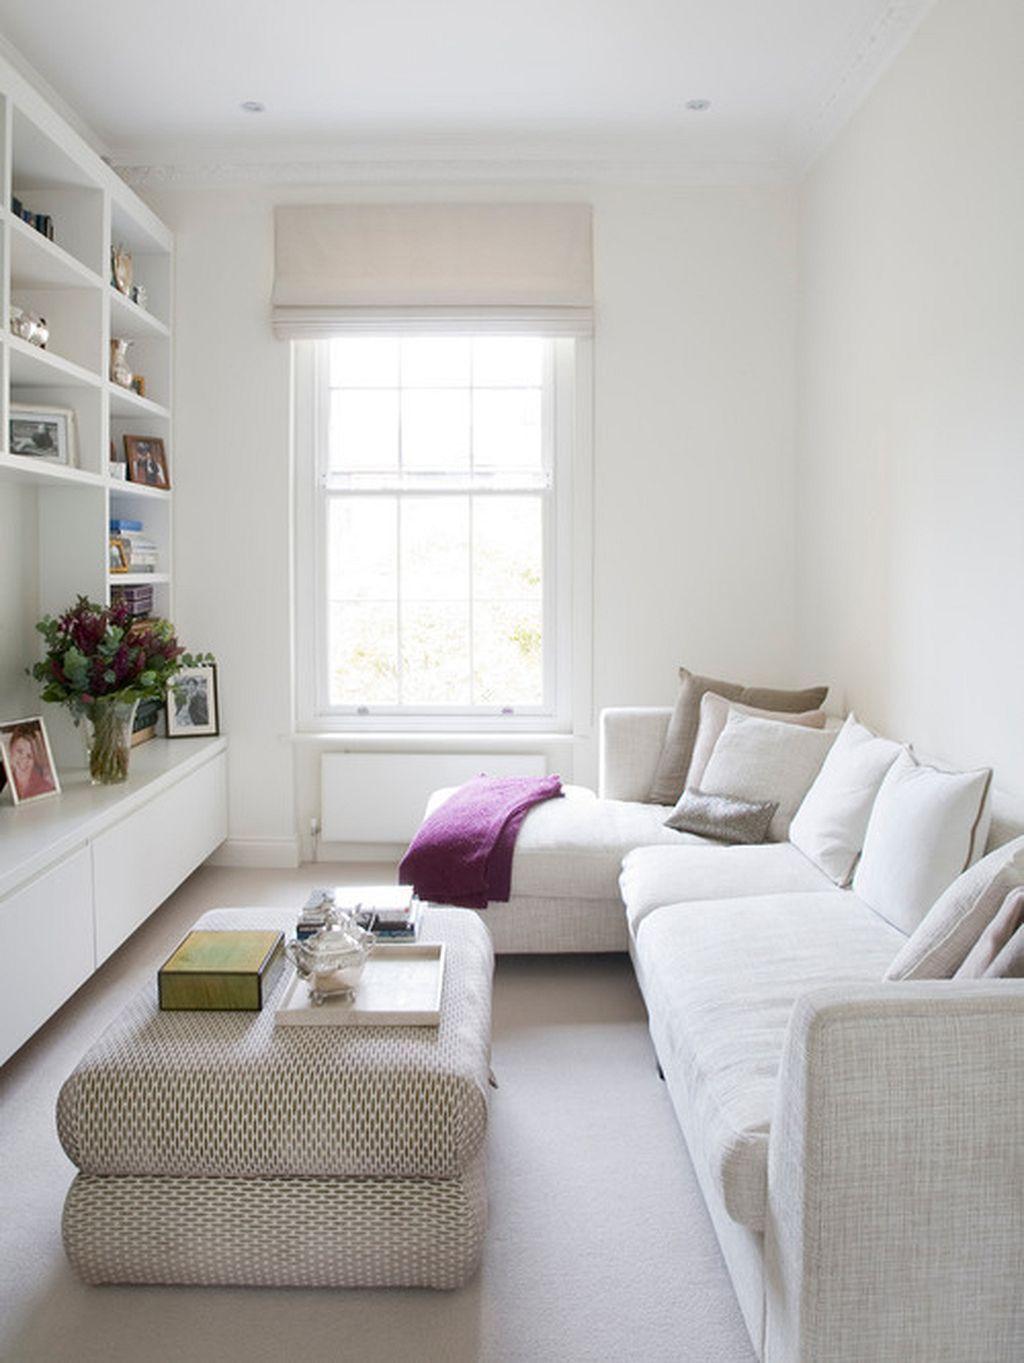 Small Living Room Tv Ideas Smalllivingroomdecorideas Tiny Living Room Ideas Apartment Sma Small Living Room Design Small Living Room Decor Narrow Living Room